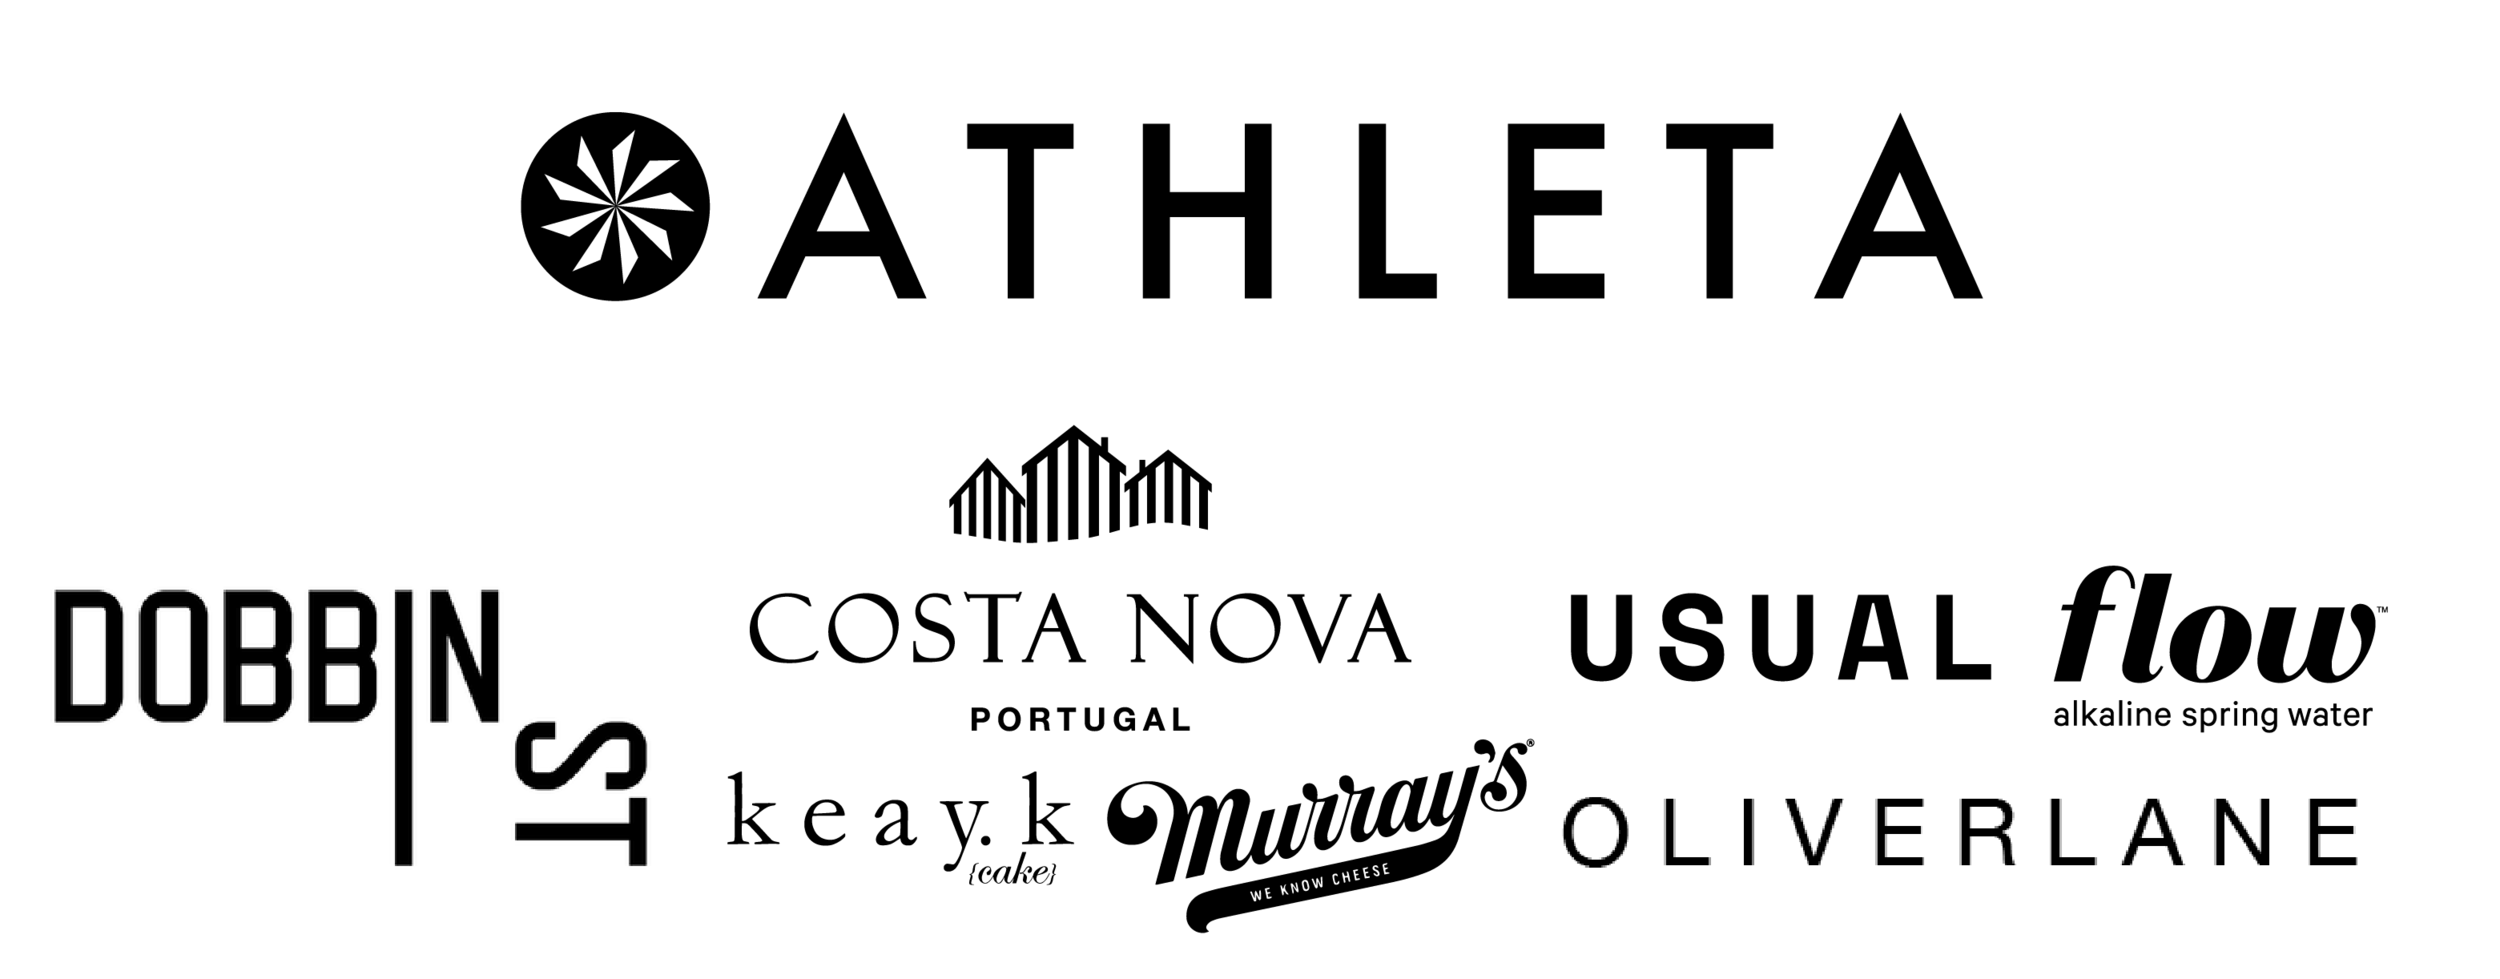 2019 01_Partner Logos.png